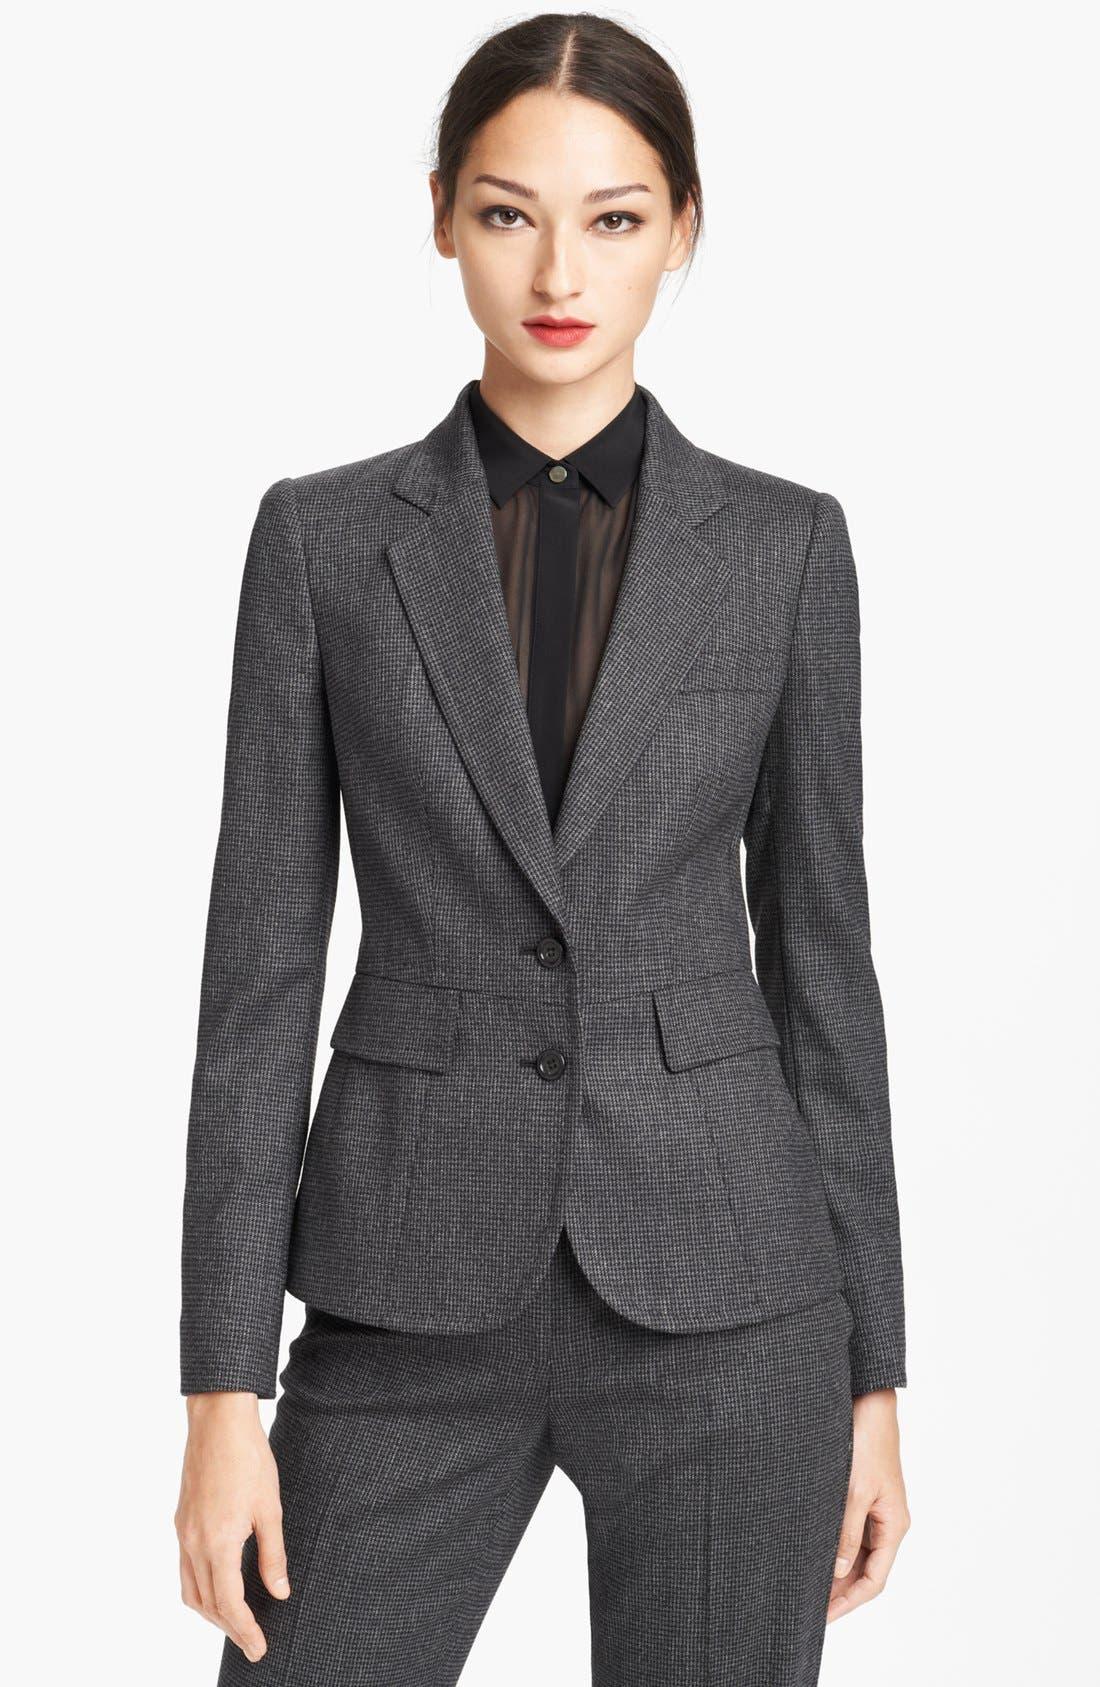 Alternate Image 1 Selected - Dolce&Gabbana Houndstooth Jacket